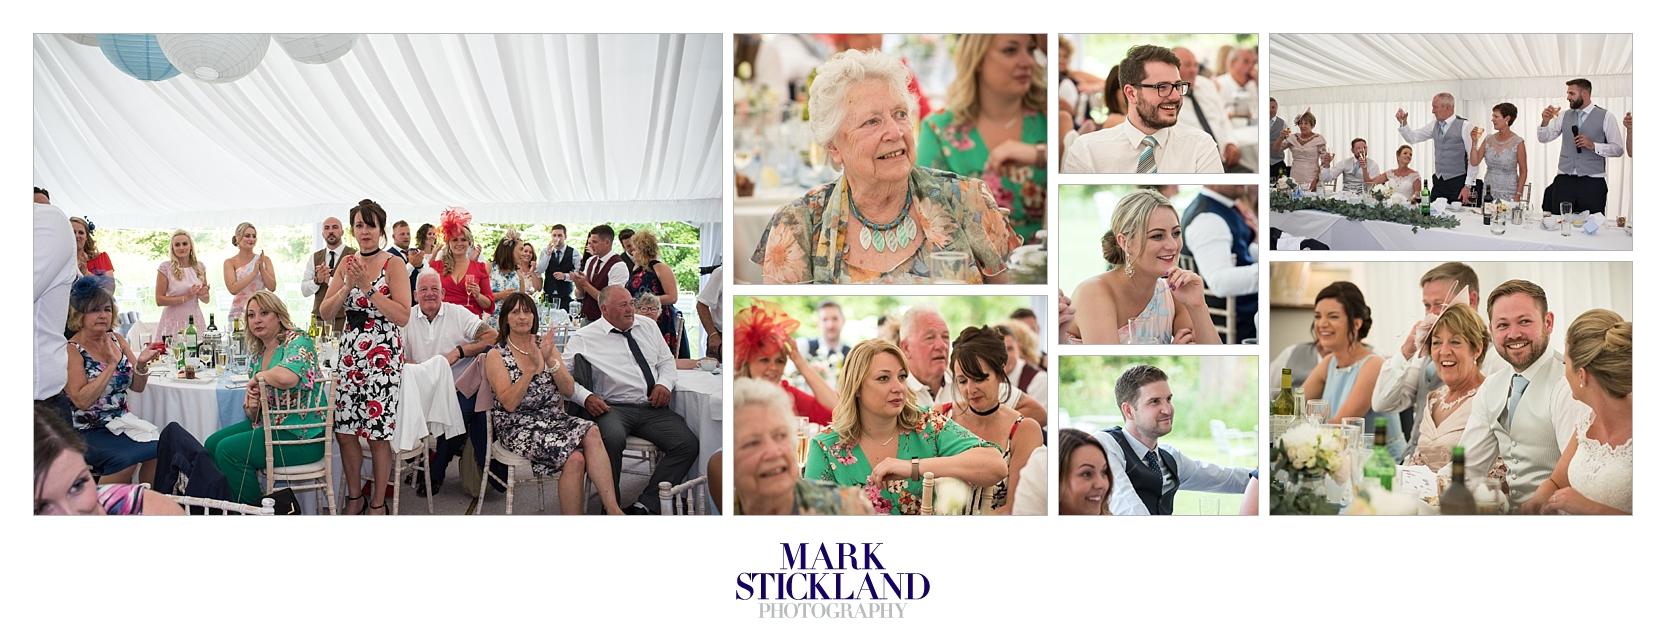 039.deans_court_wedding_wimborne_dorset